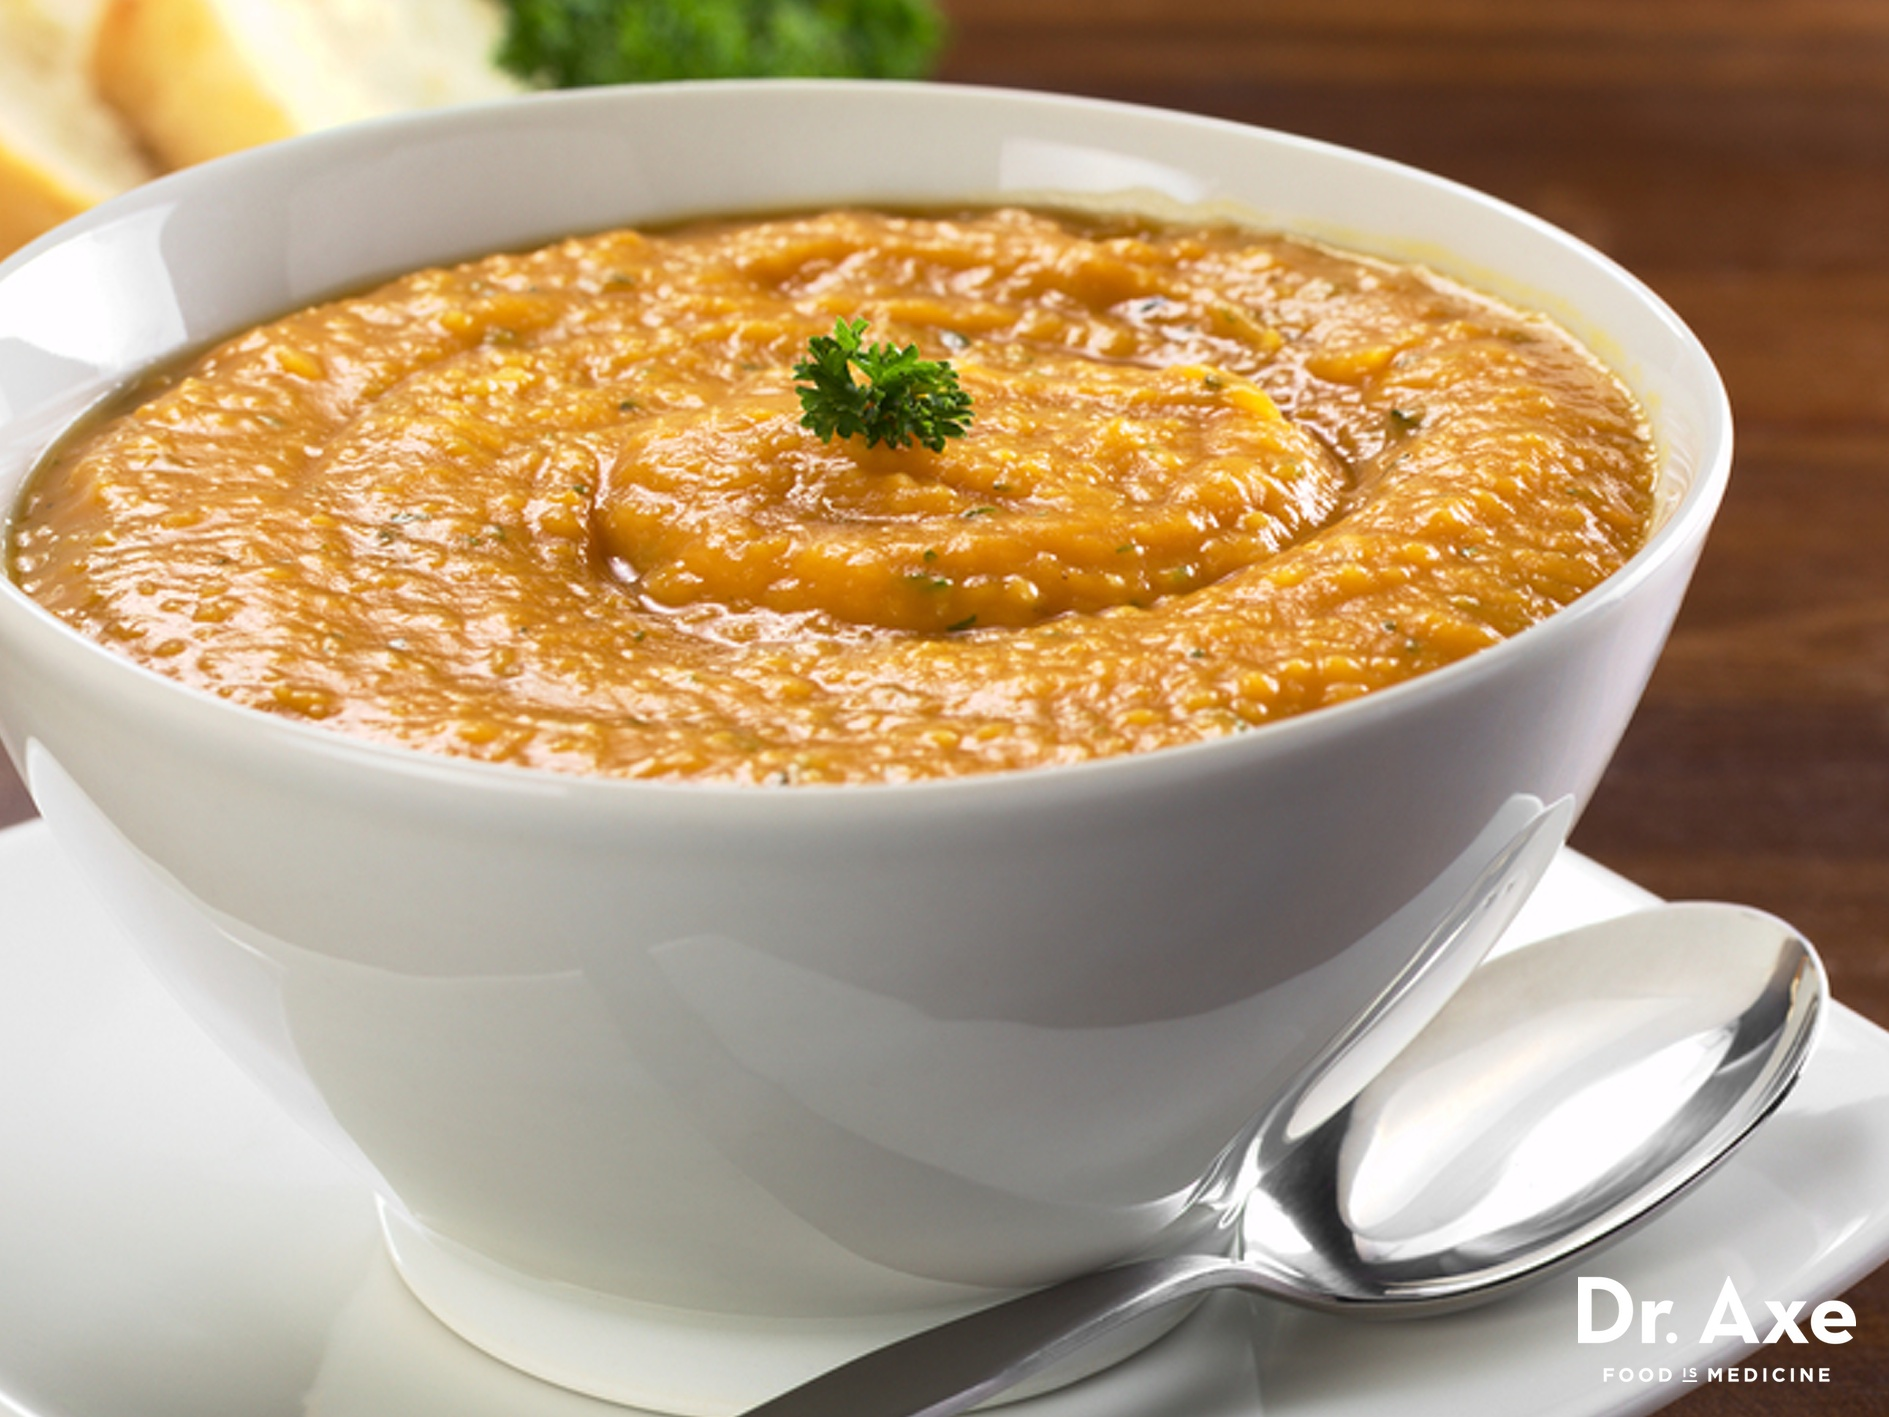 Roasted-Garlic-Sweet-Potato-Soup